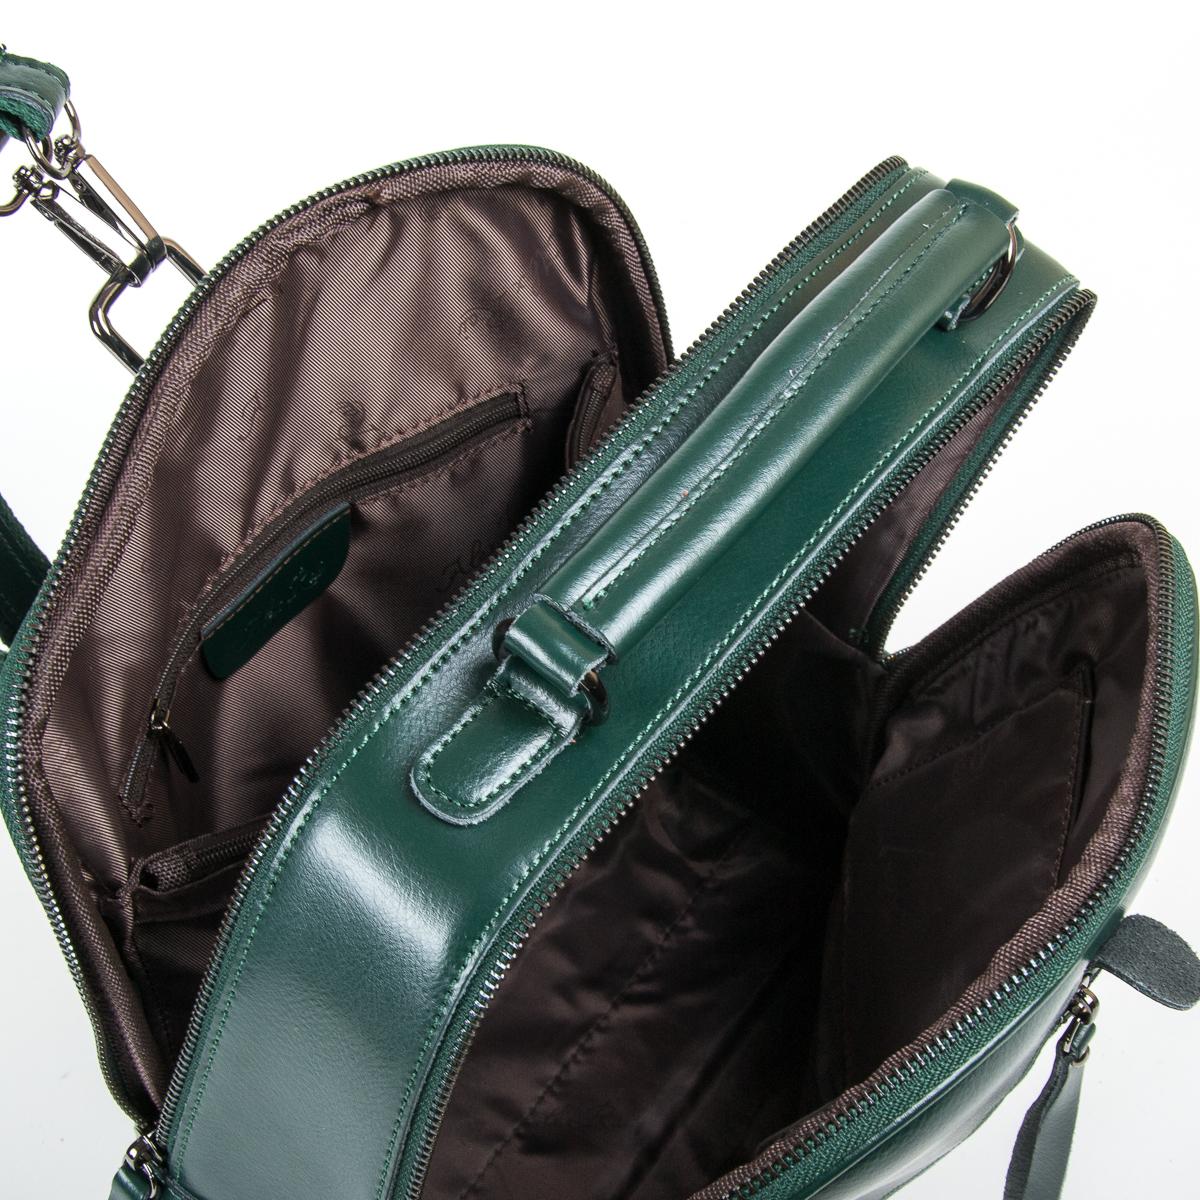 Сумка Женская Рюкзак кожа ALEX RAI 9-01 8694-3 green - фото 5